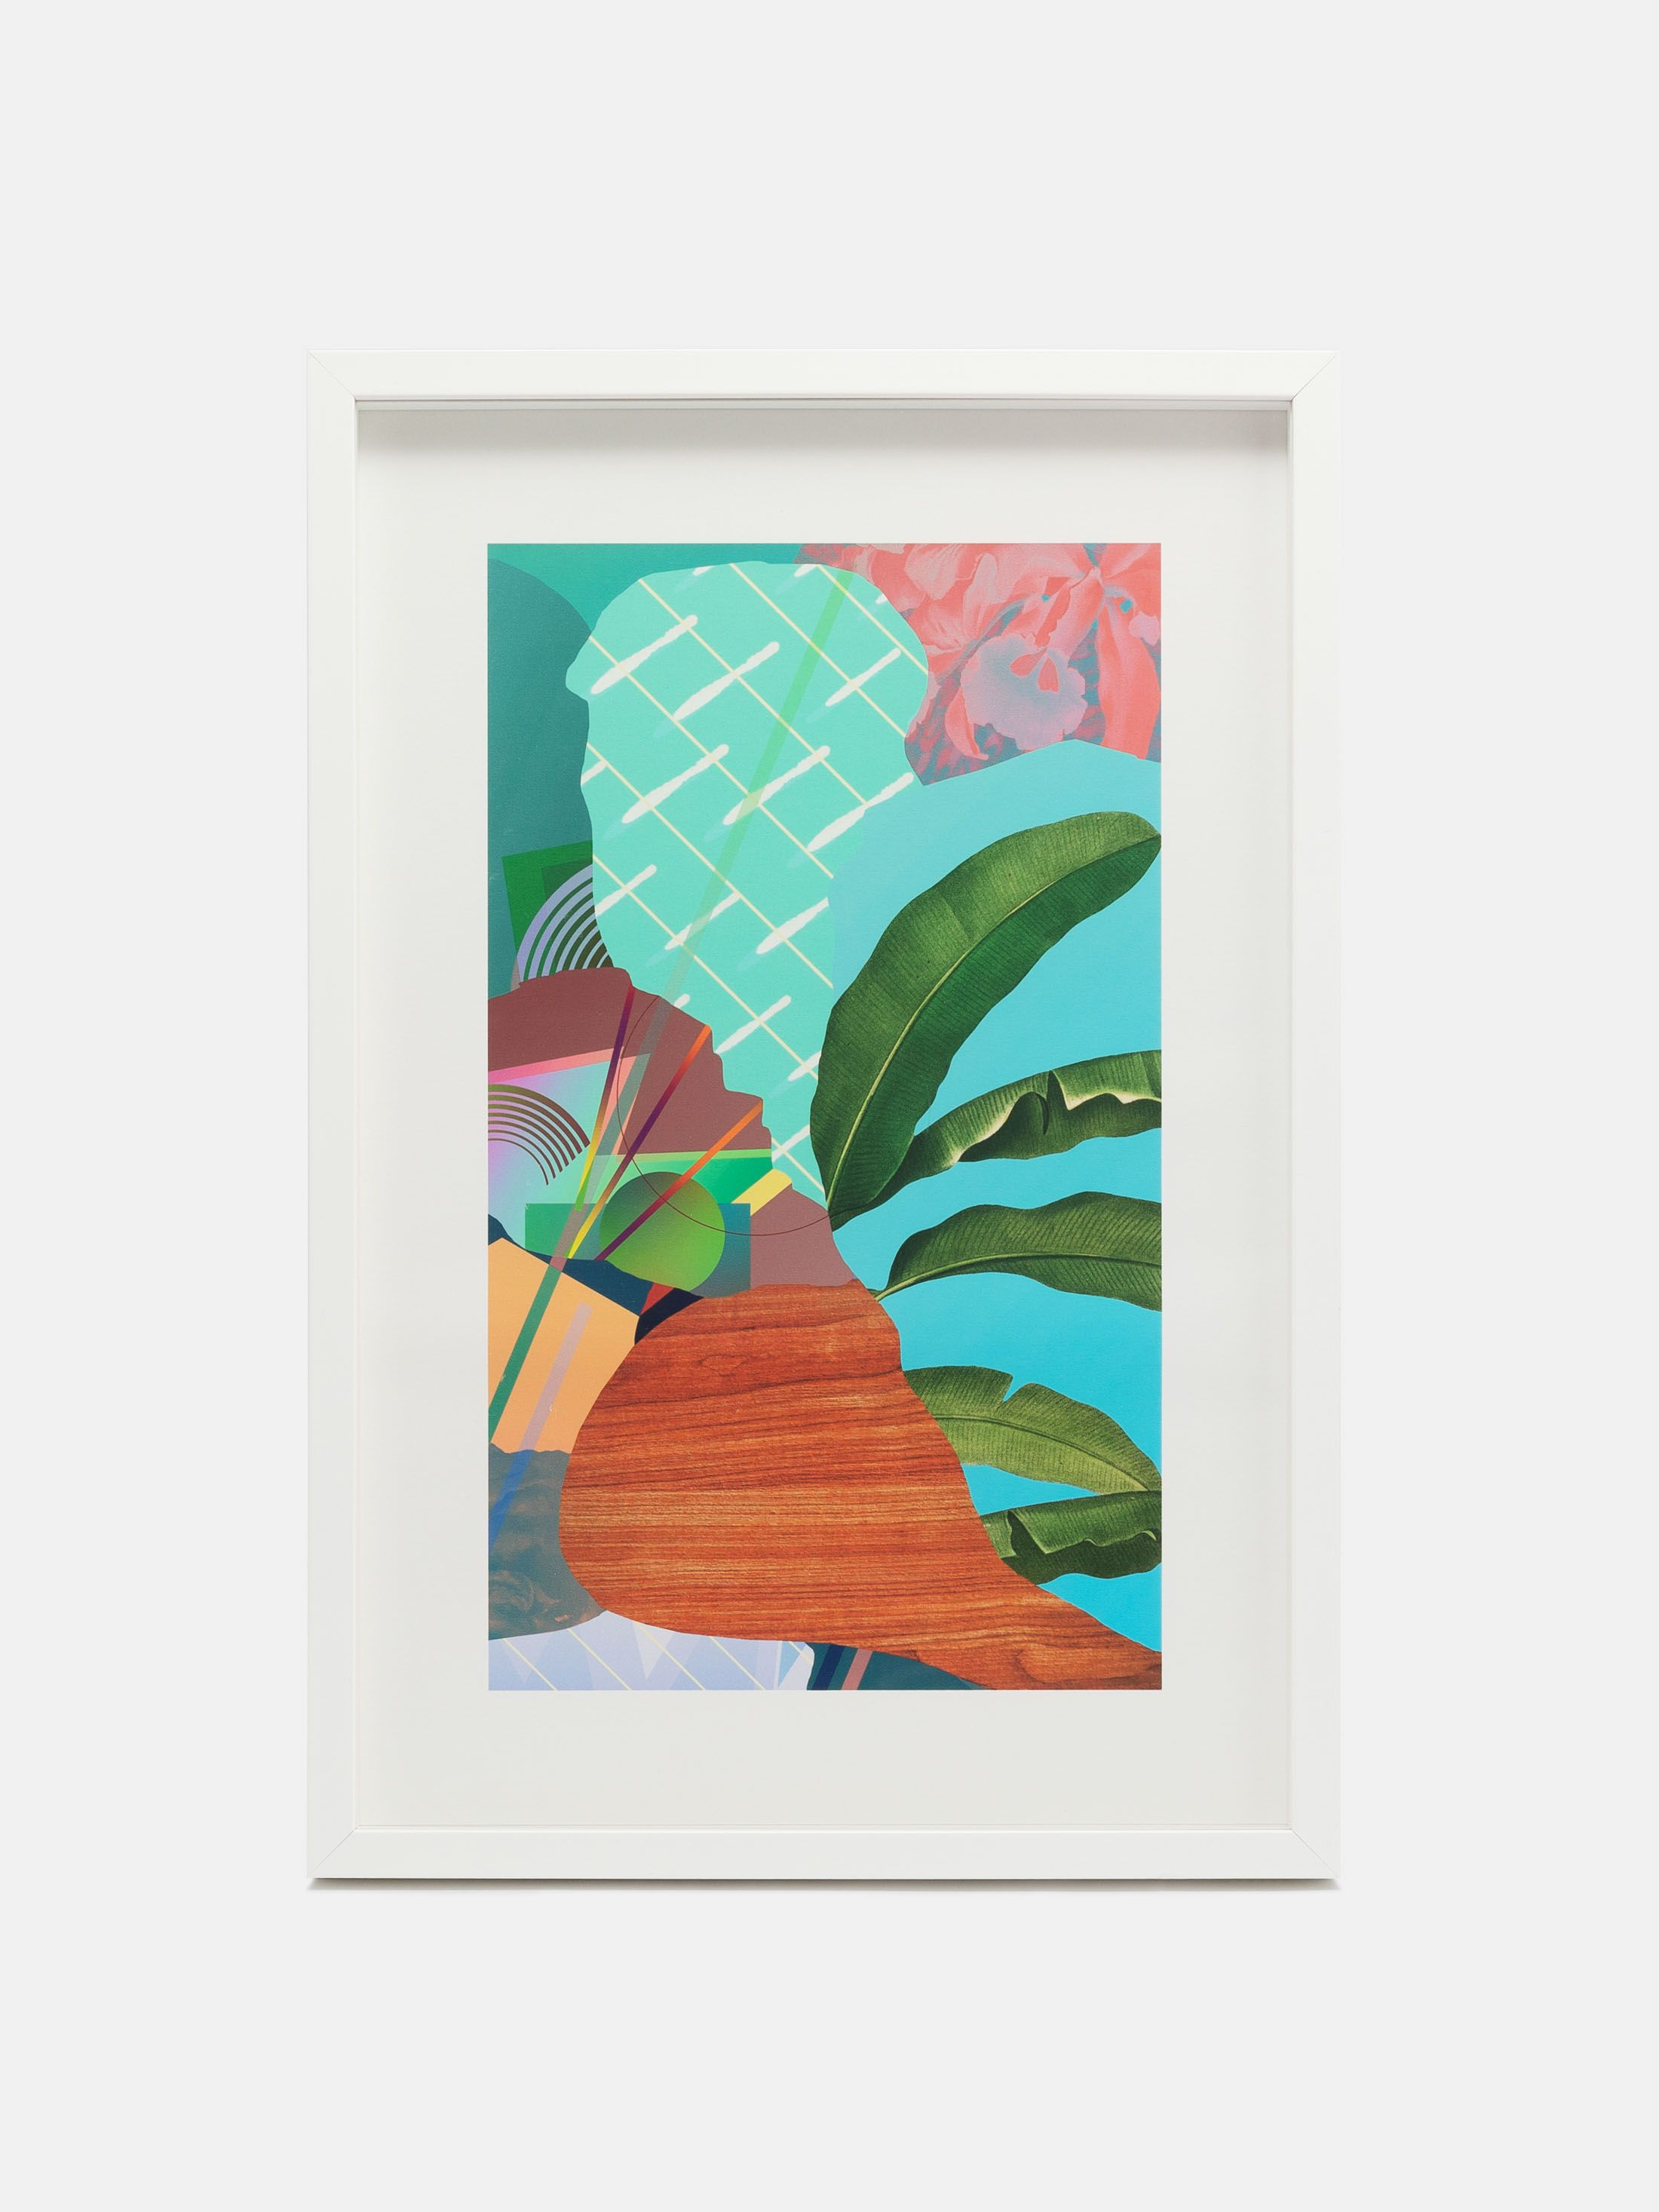 custom printed art prints with frame